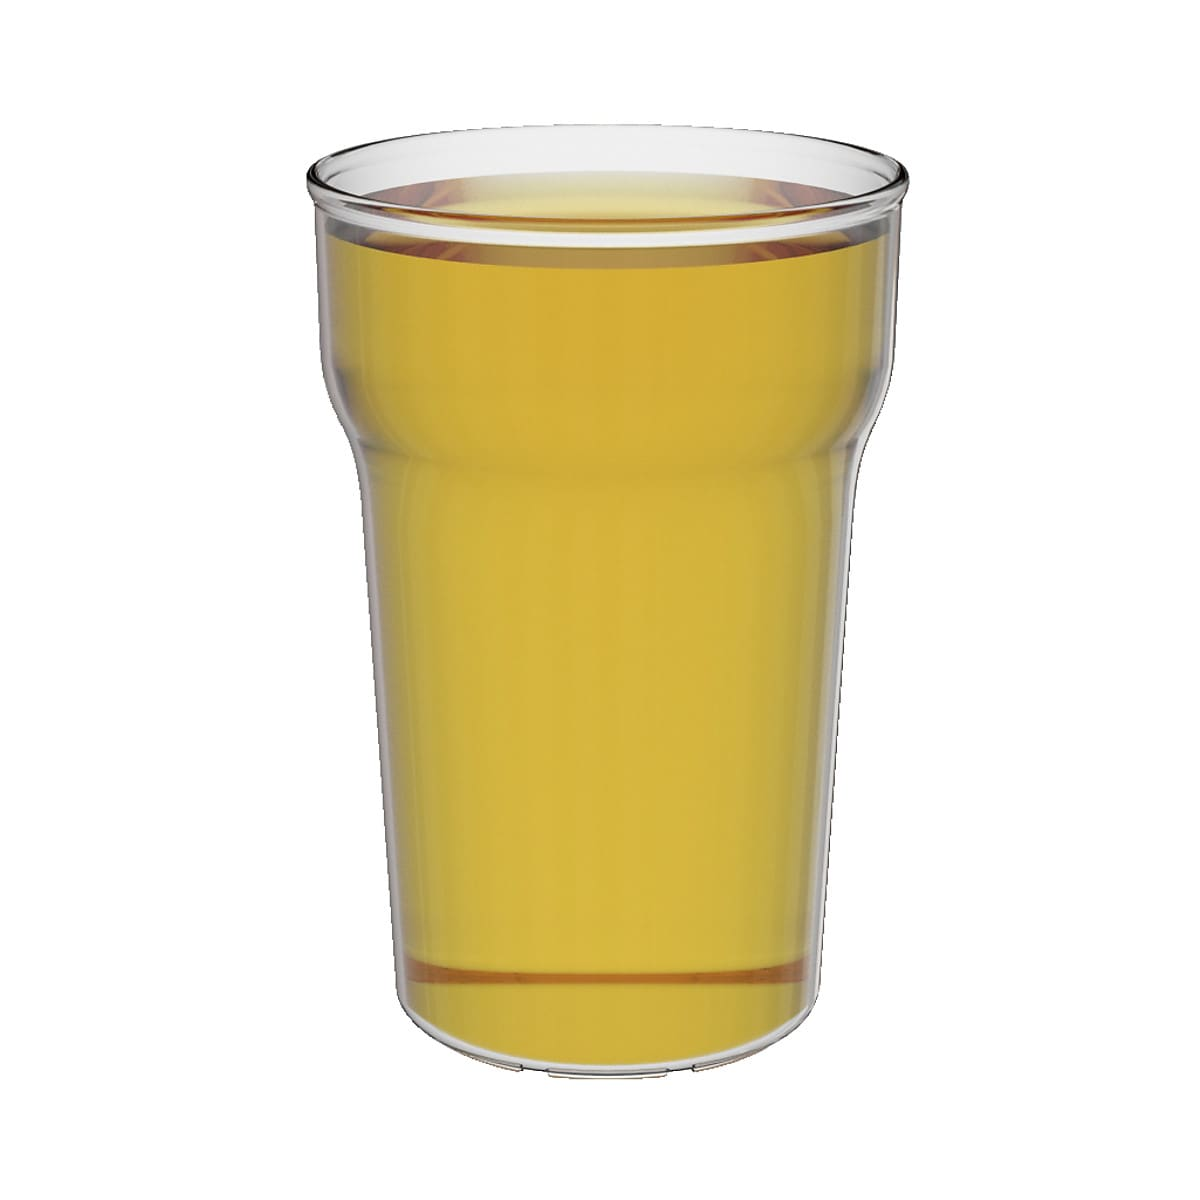 Ölglas Classic Pint 56,8 cl